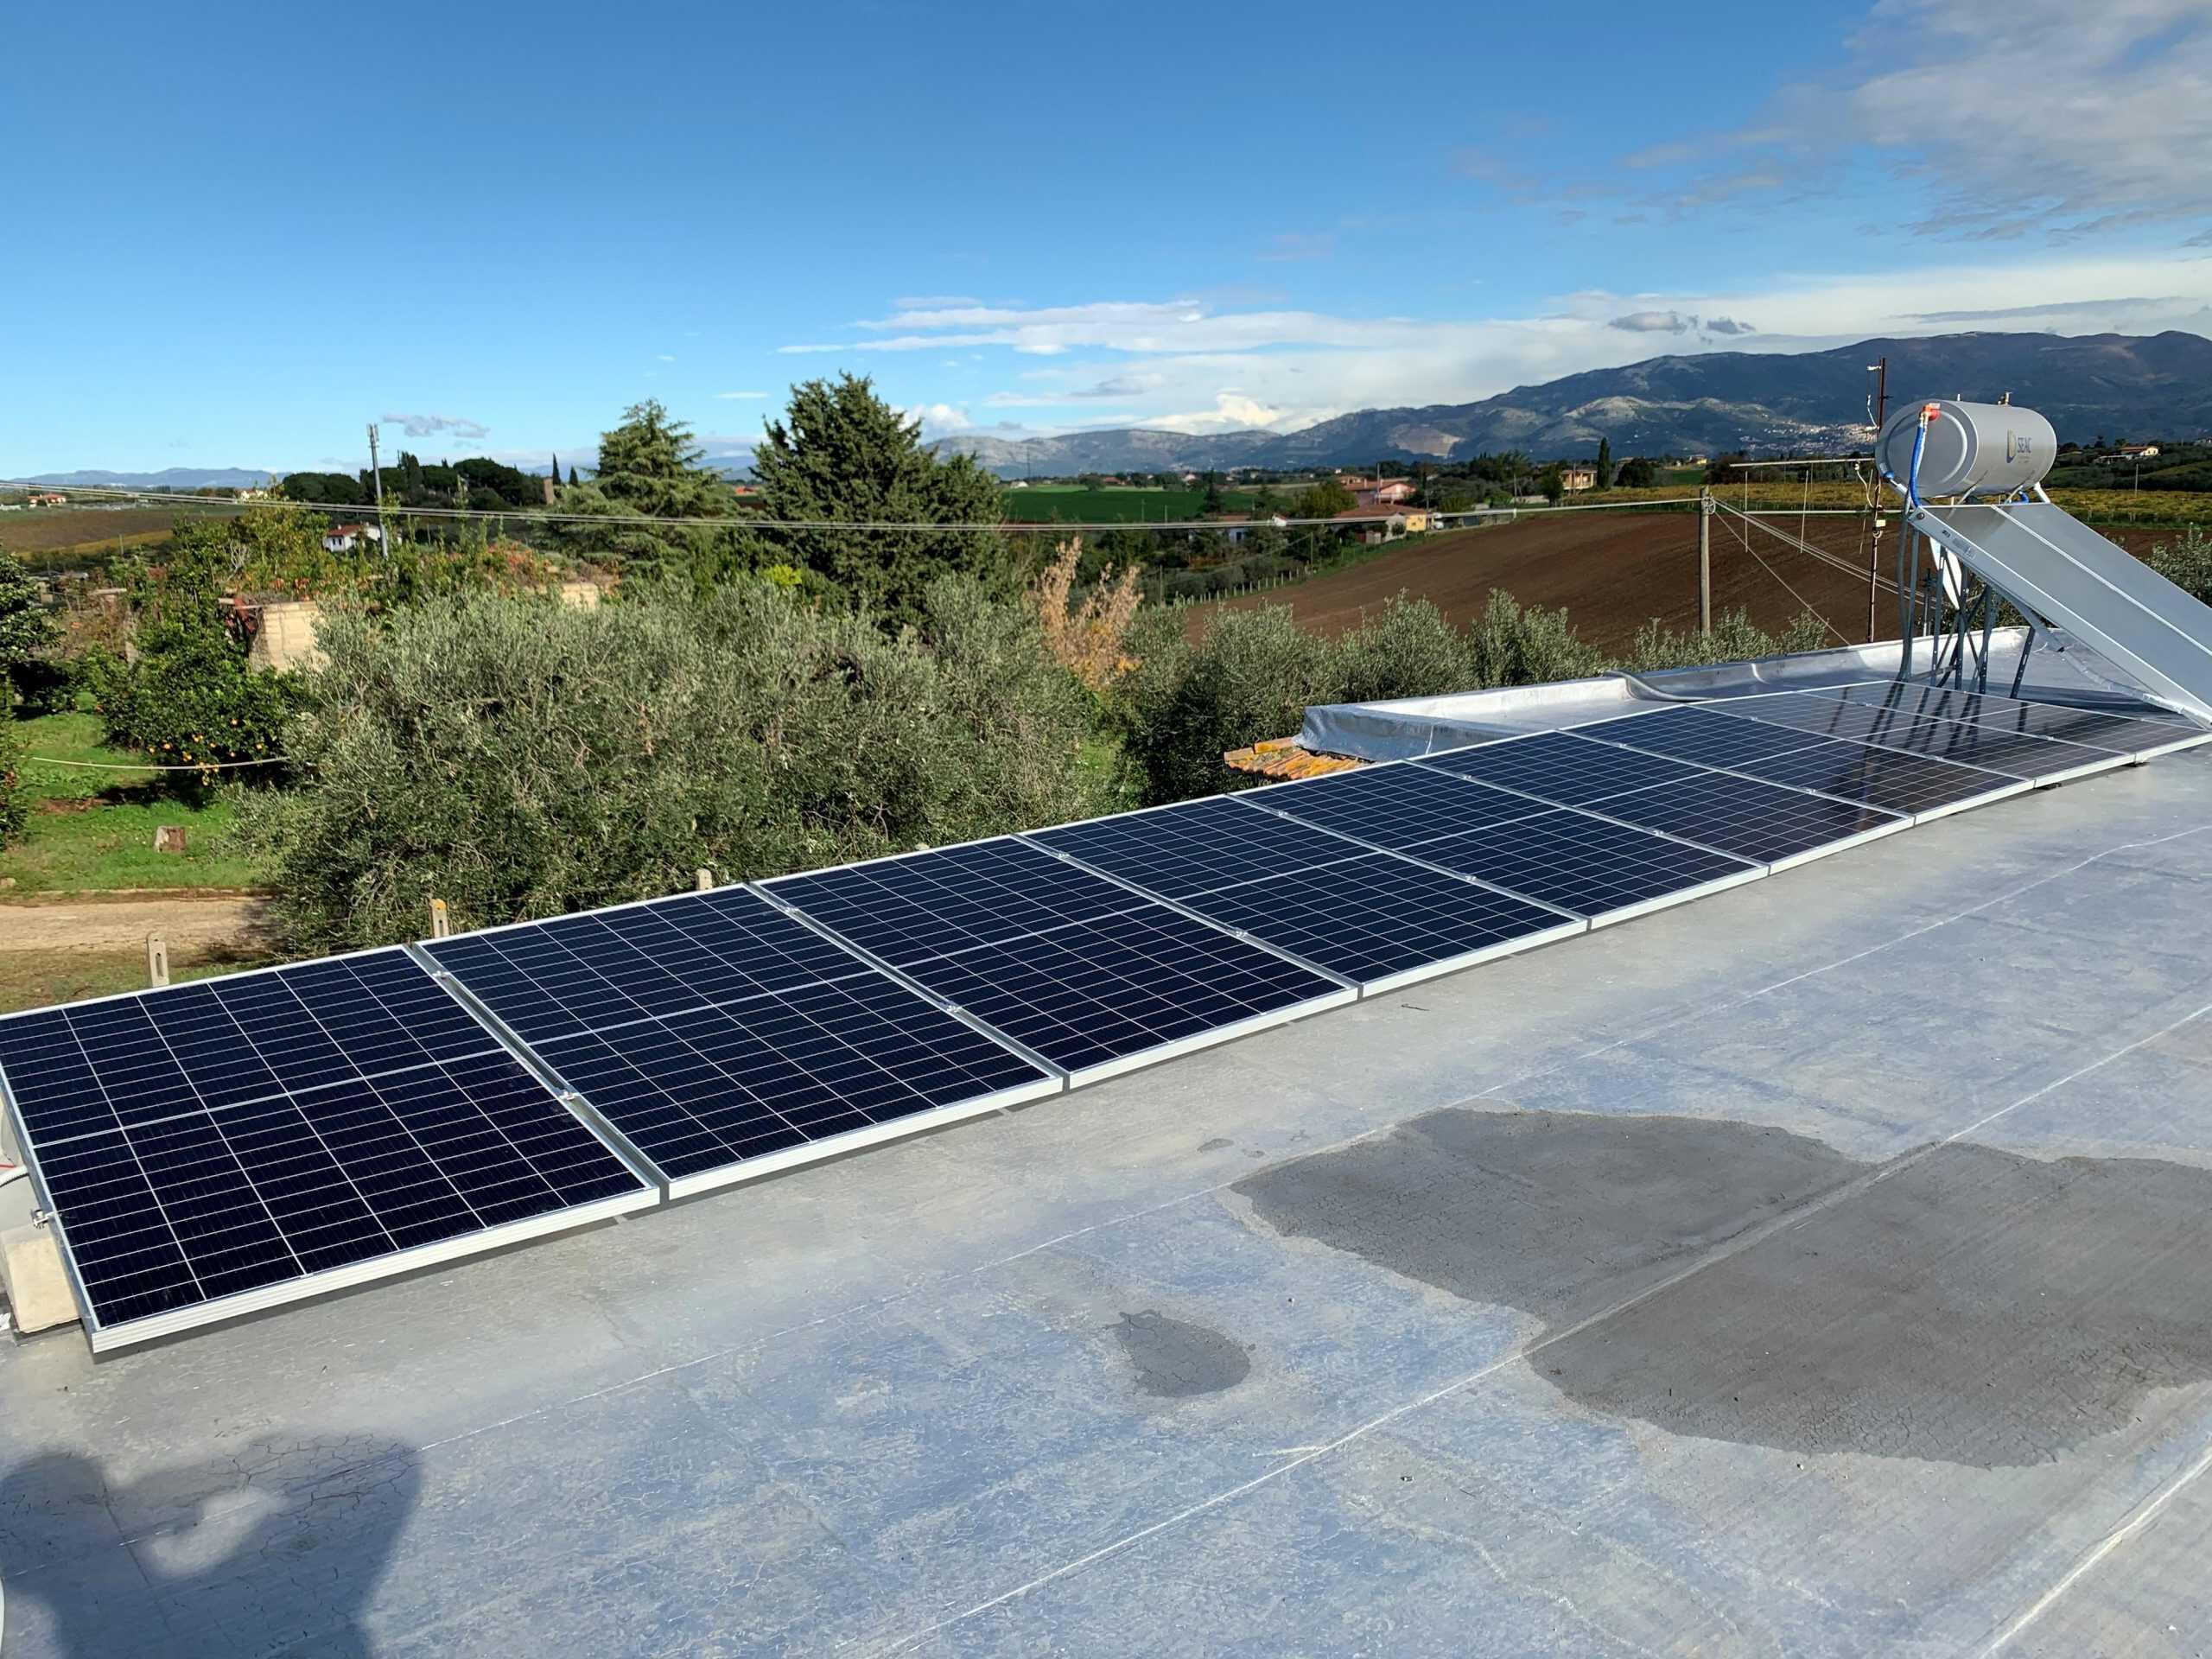 Bio Solare 3 Srl - Velletri (RM) - Italy